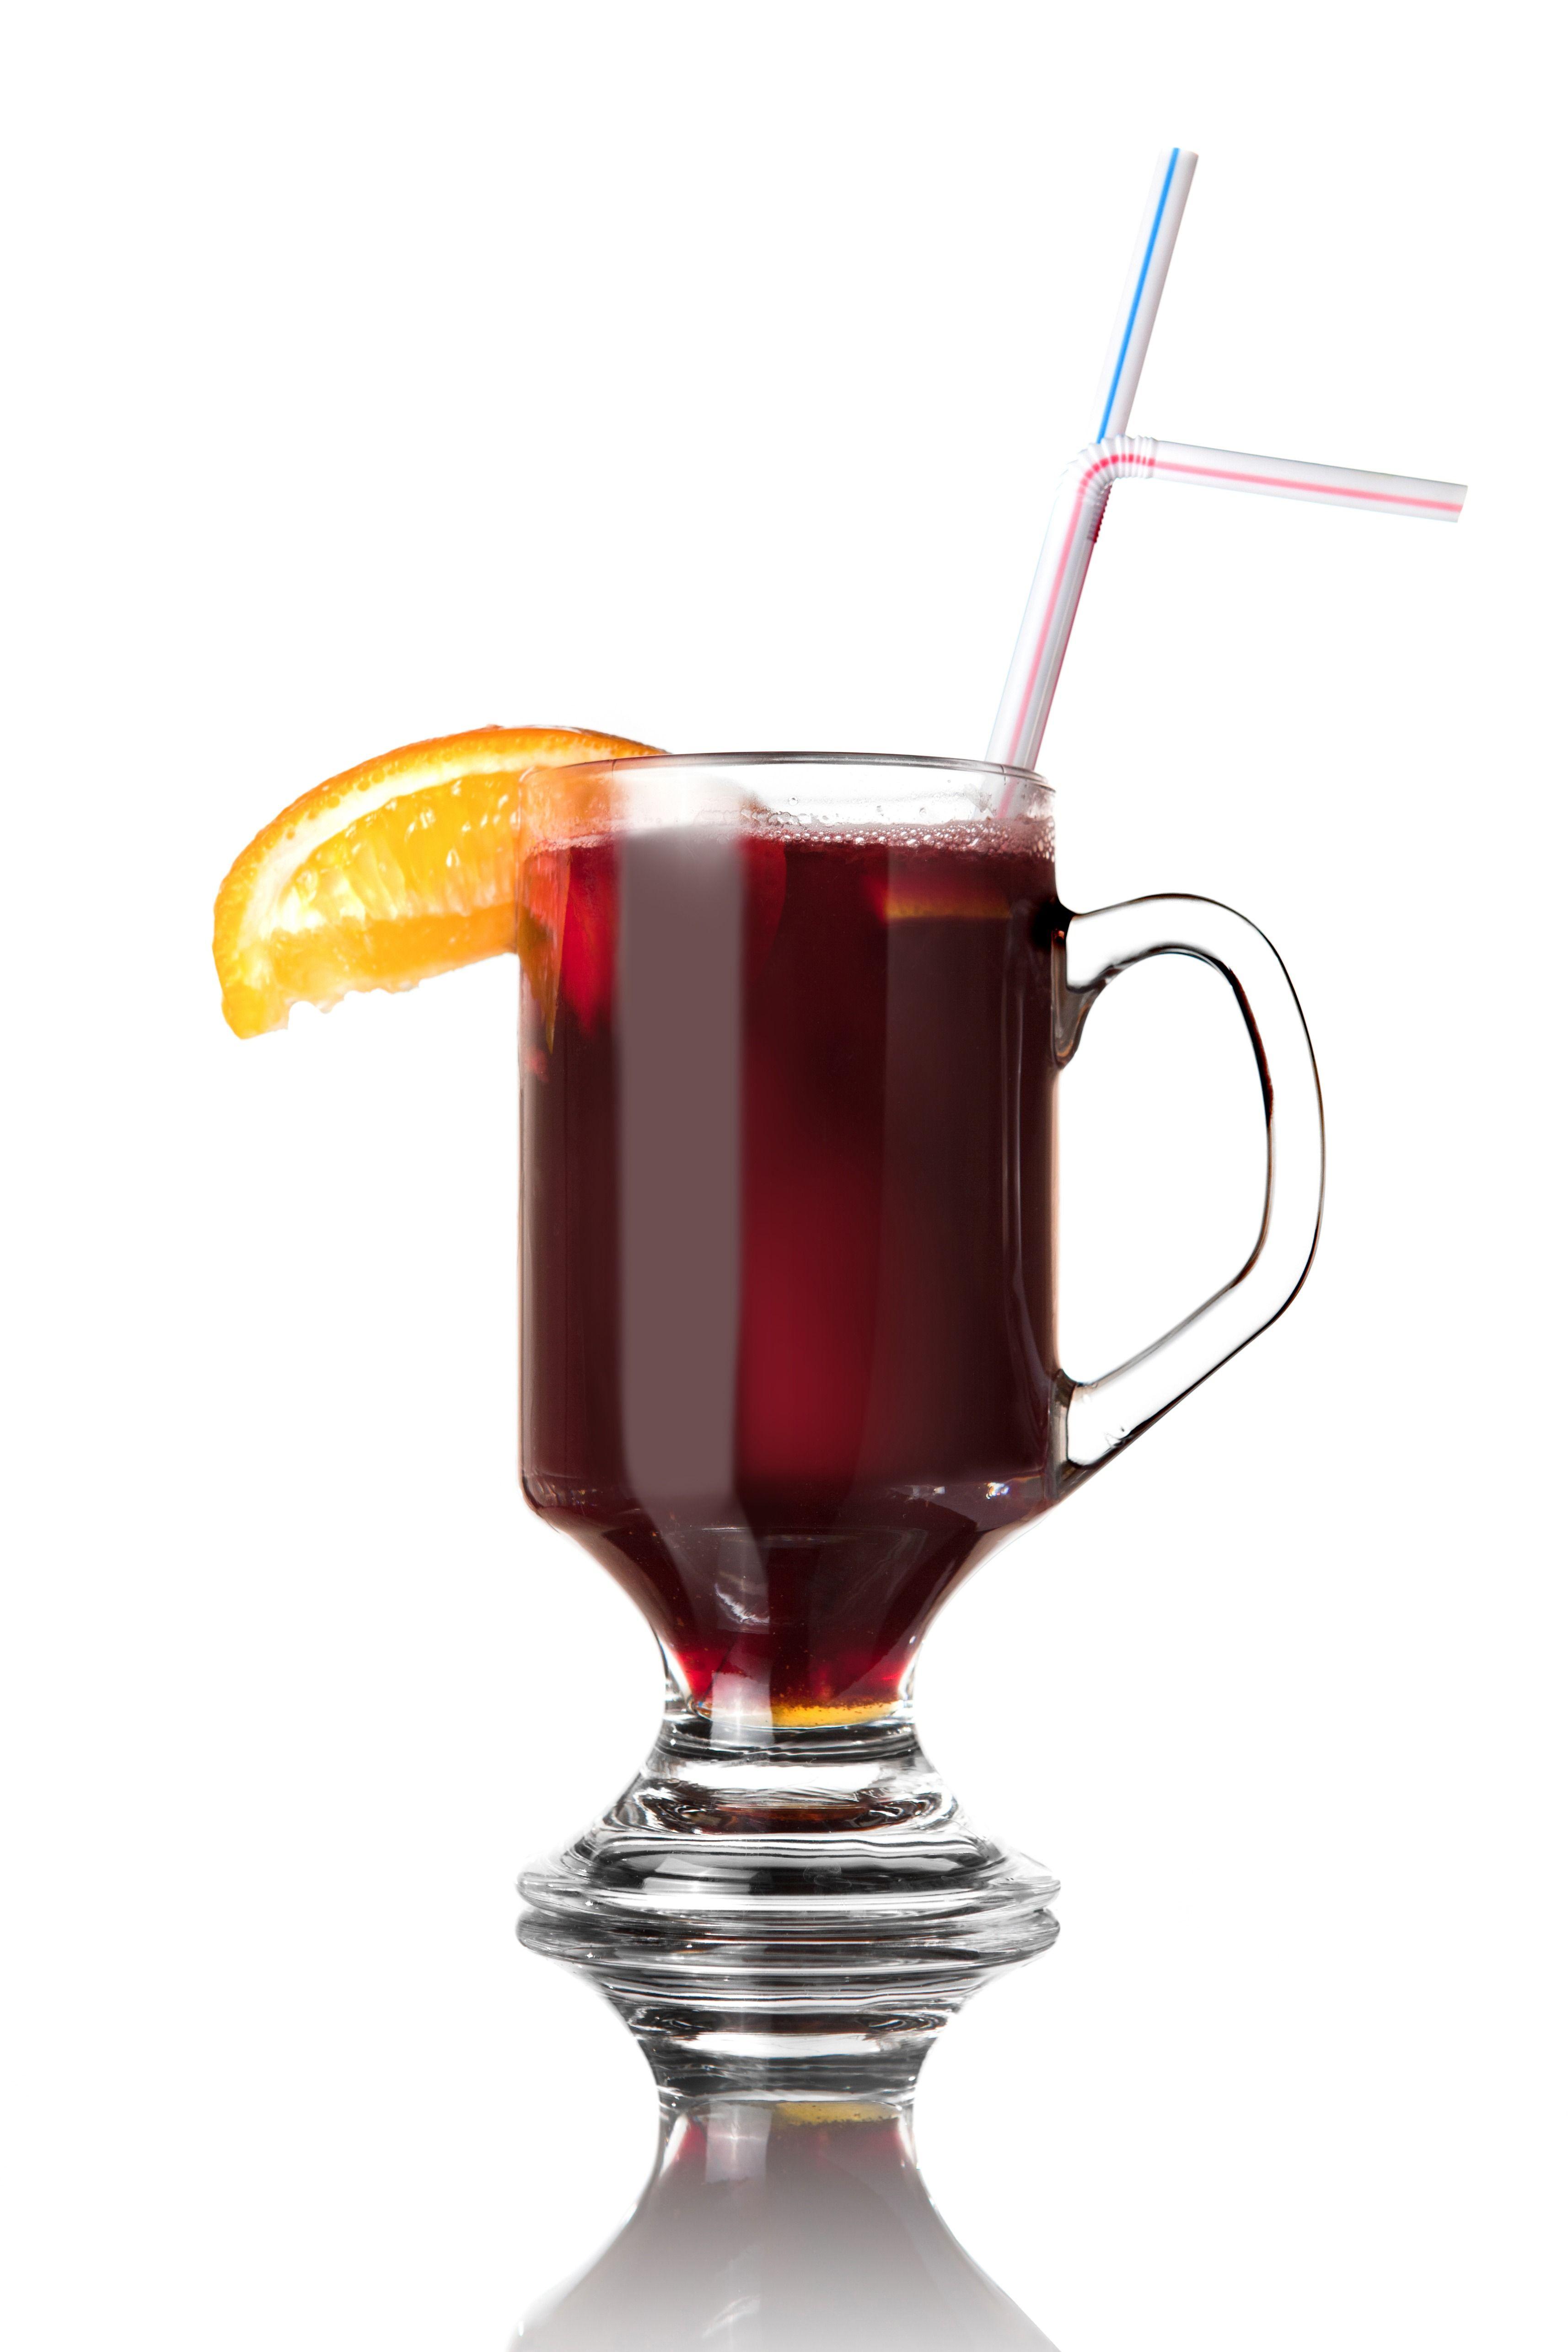 كبايات عصير زجاج Glassware Mugs Tableware